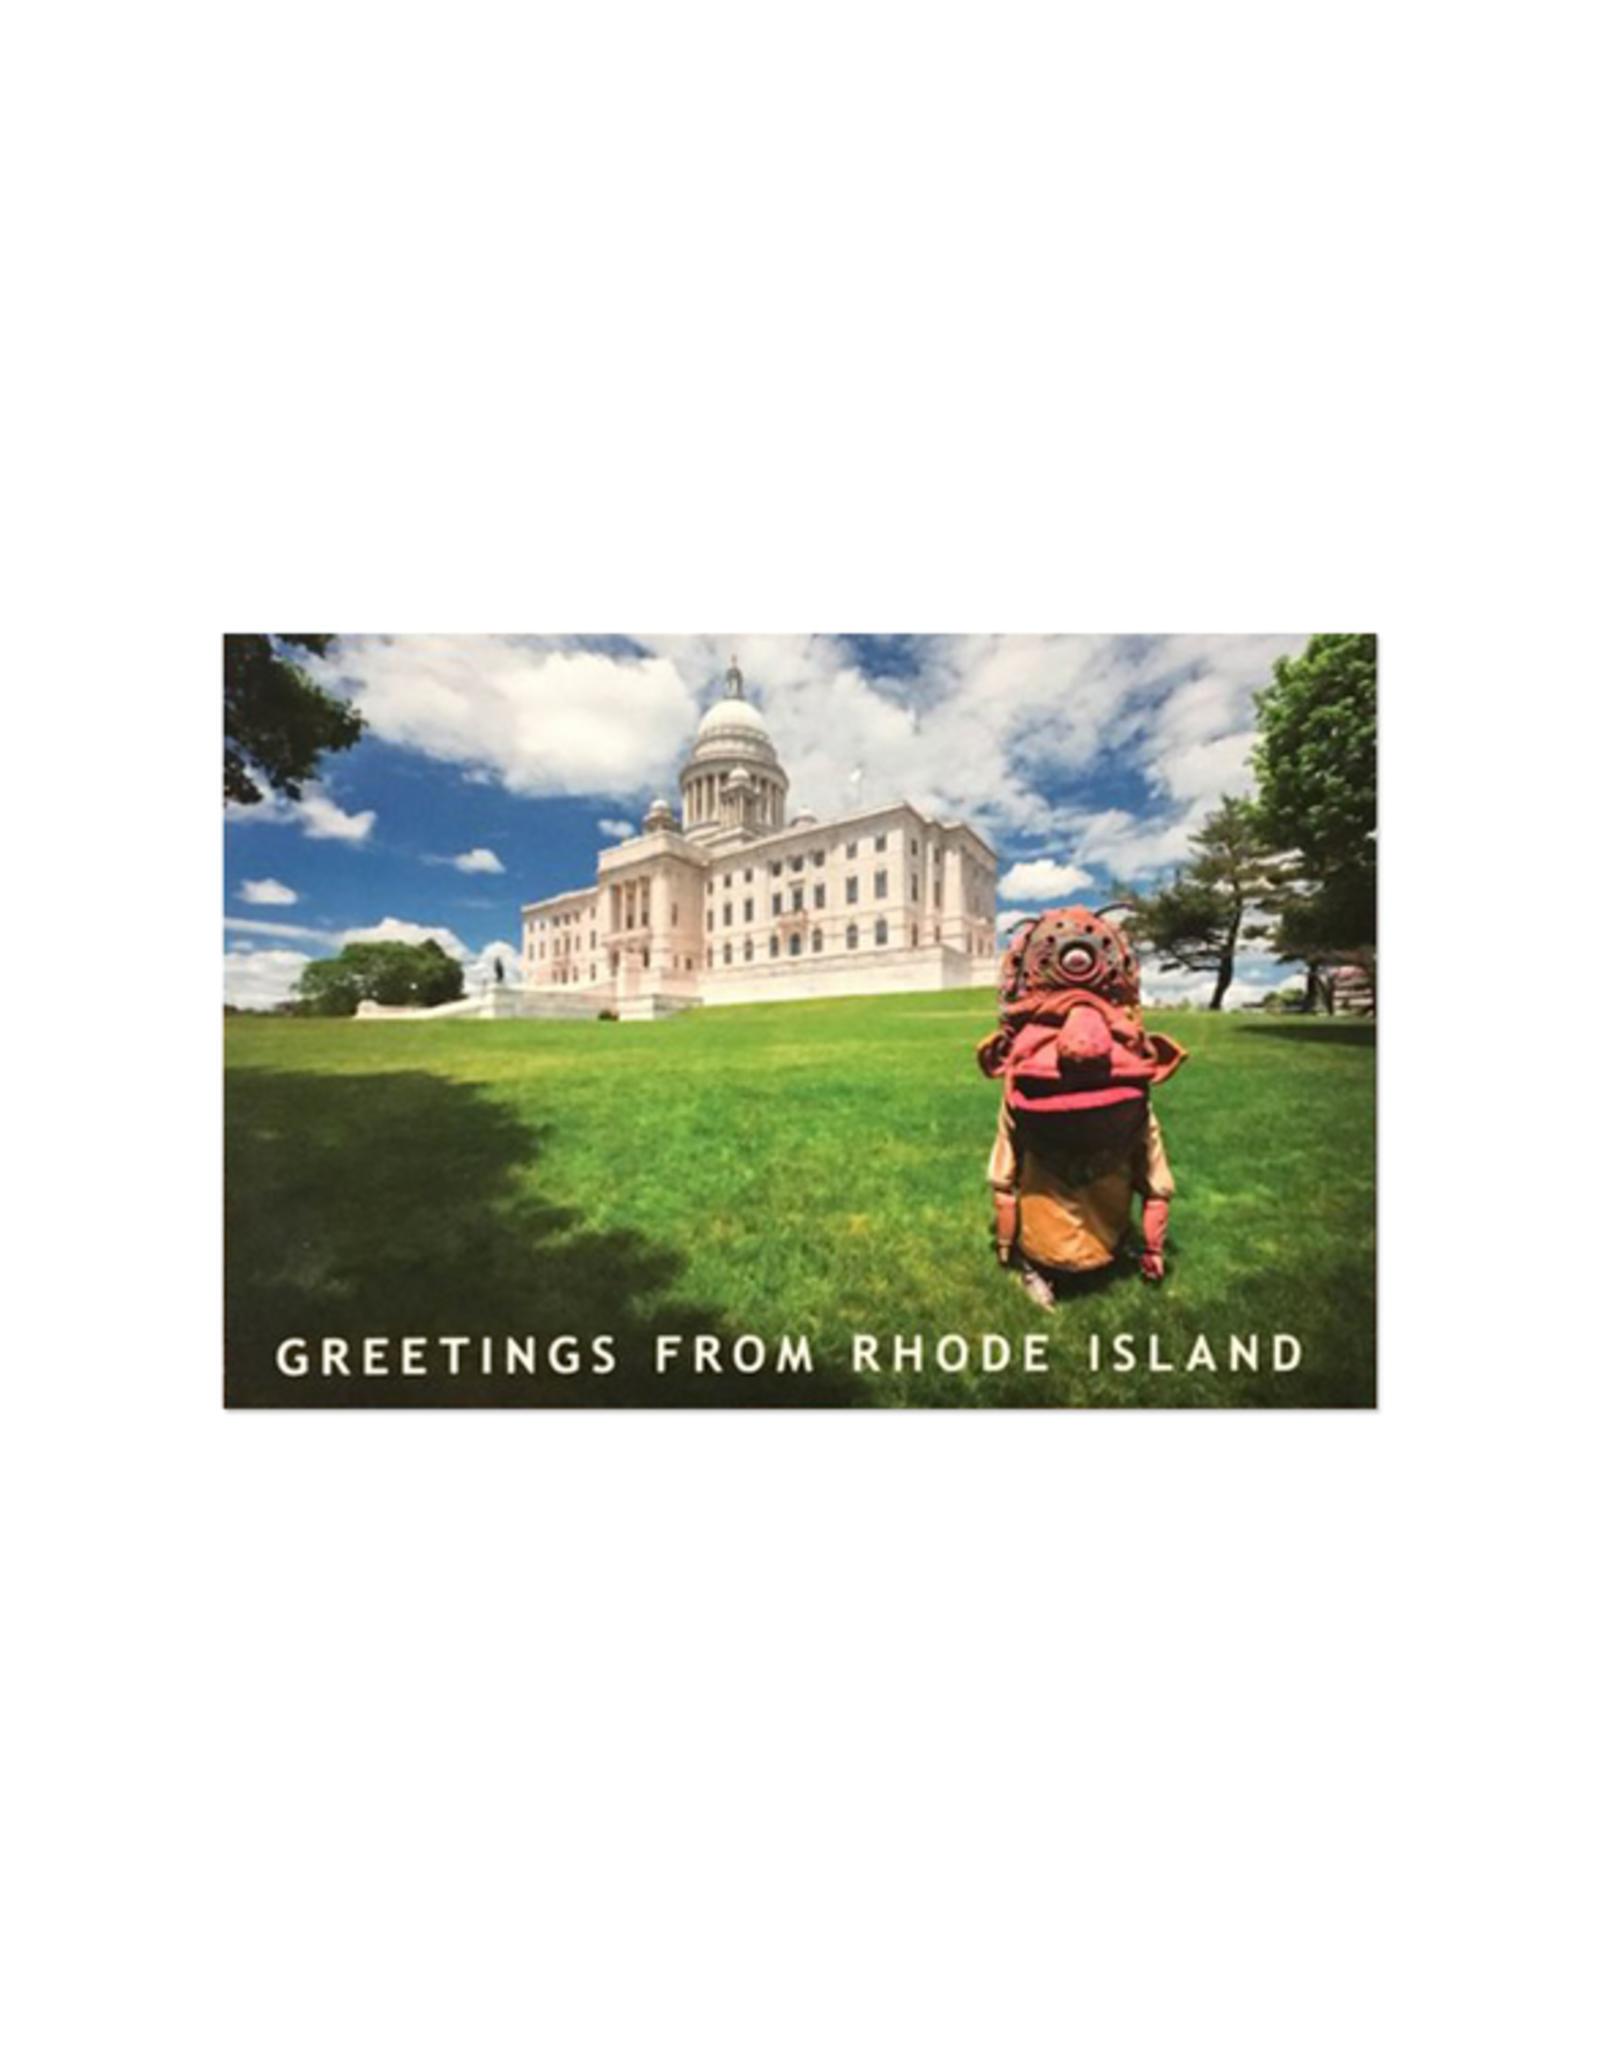 Big Nazo and State House Lawn Postcard